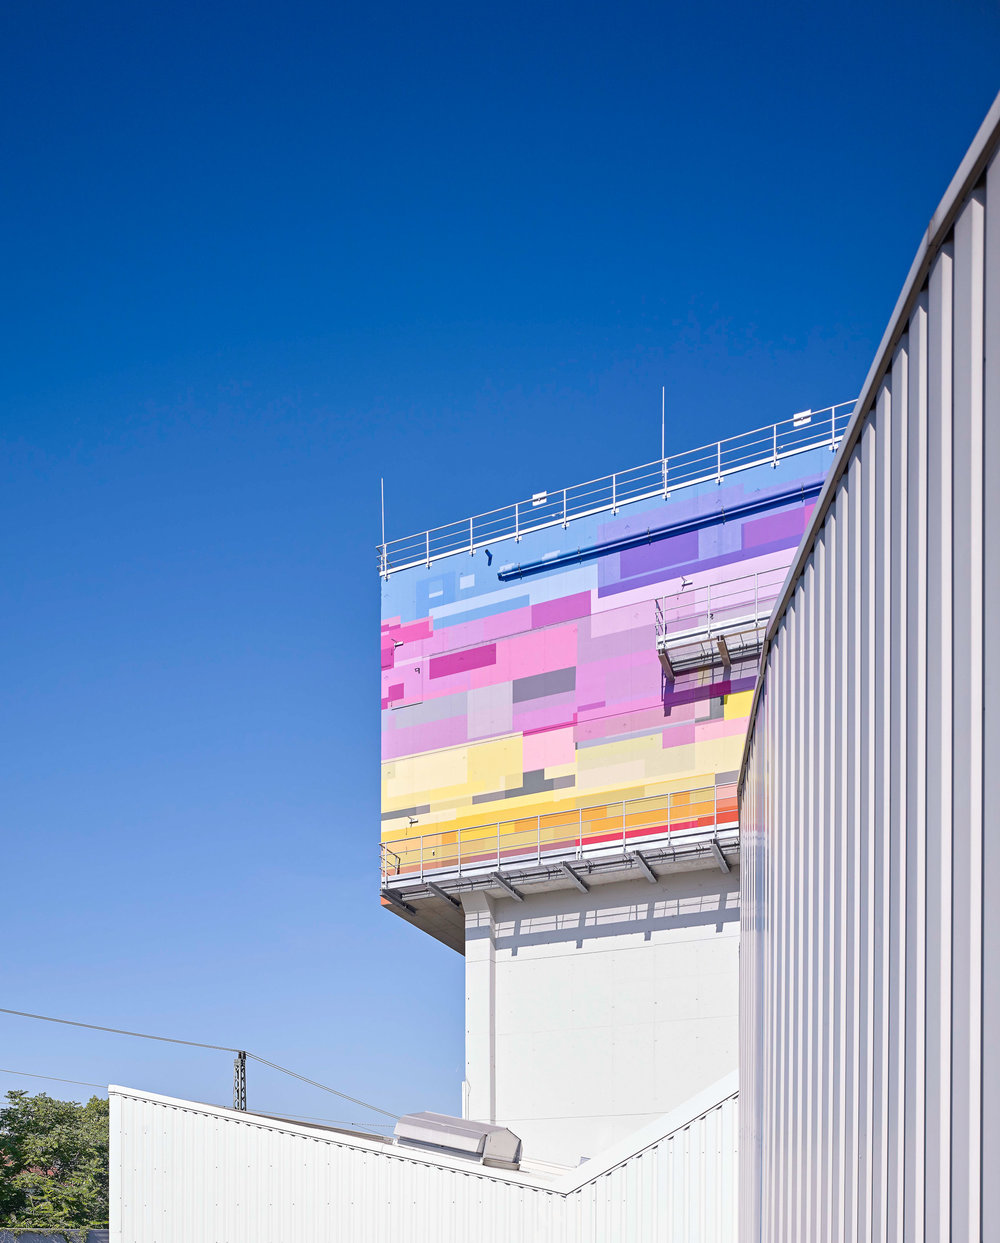 Fassadengestaltung-Industrie-ludwigshafen-gml-kunst-am-bau-modern.jpg